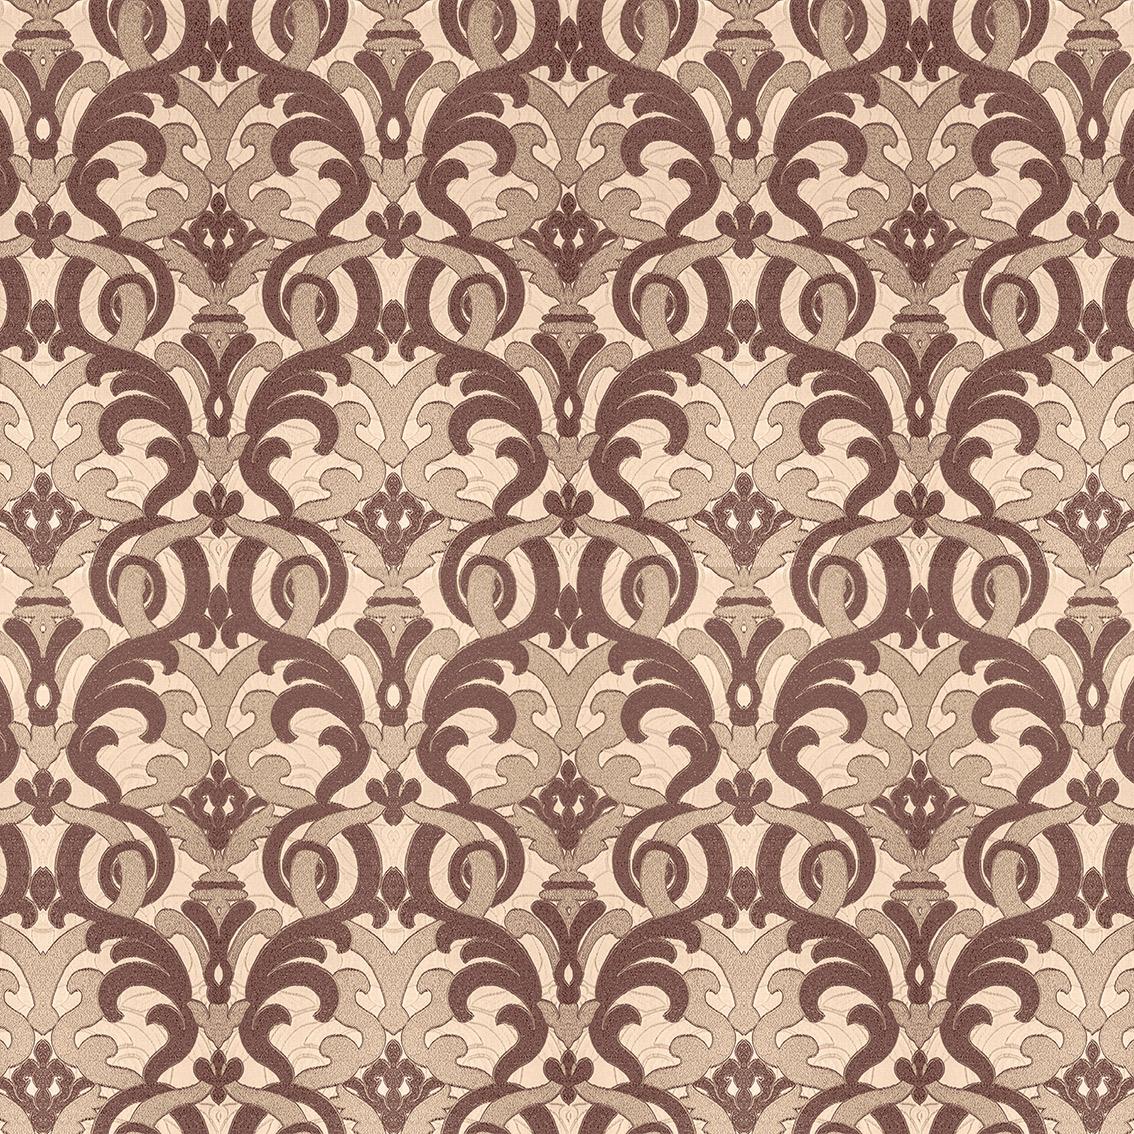 Коллекция ткани Ikarussa 5253,  купить ткань Жаккард для мебели Украина